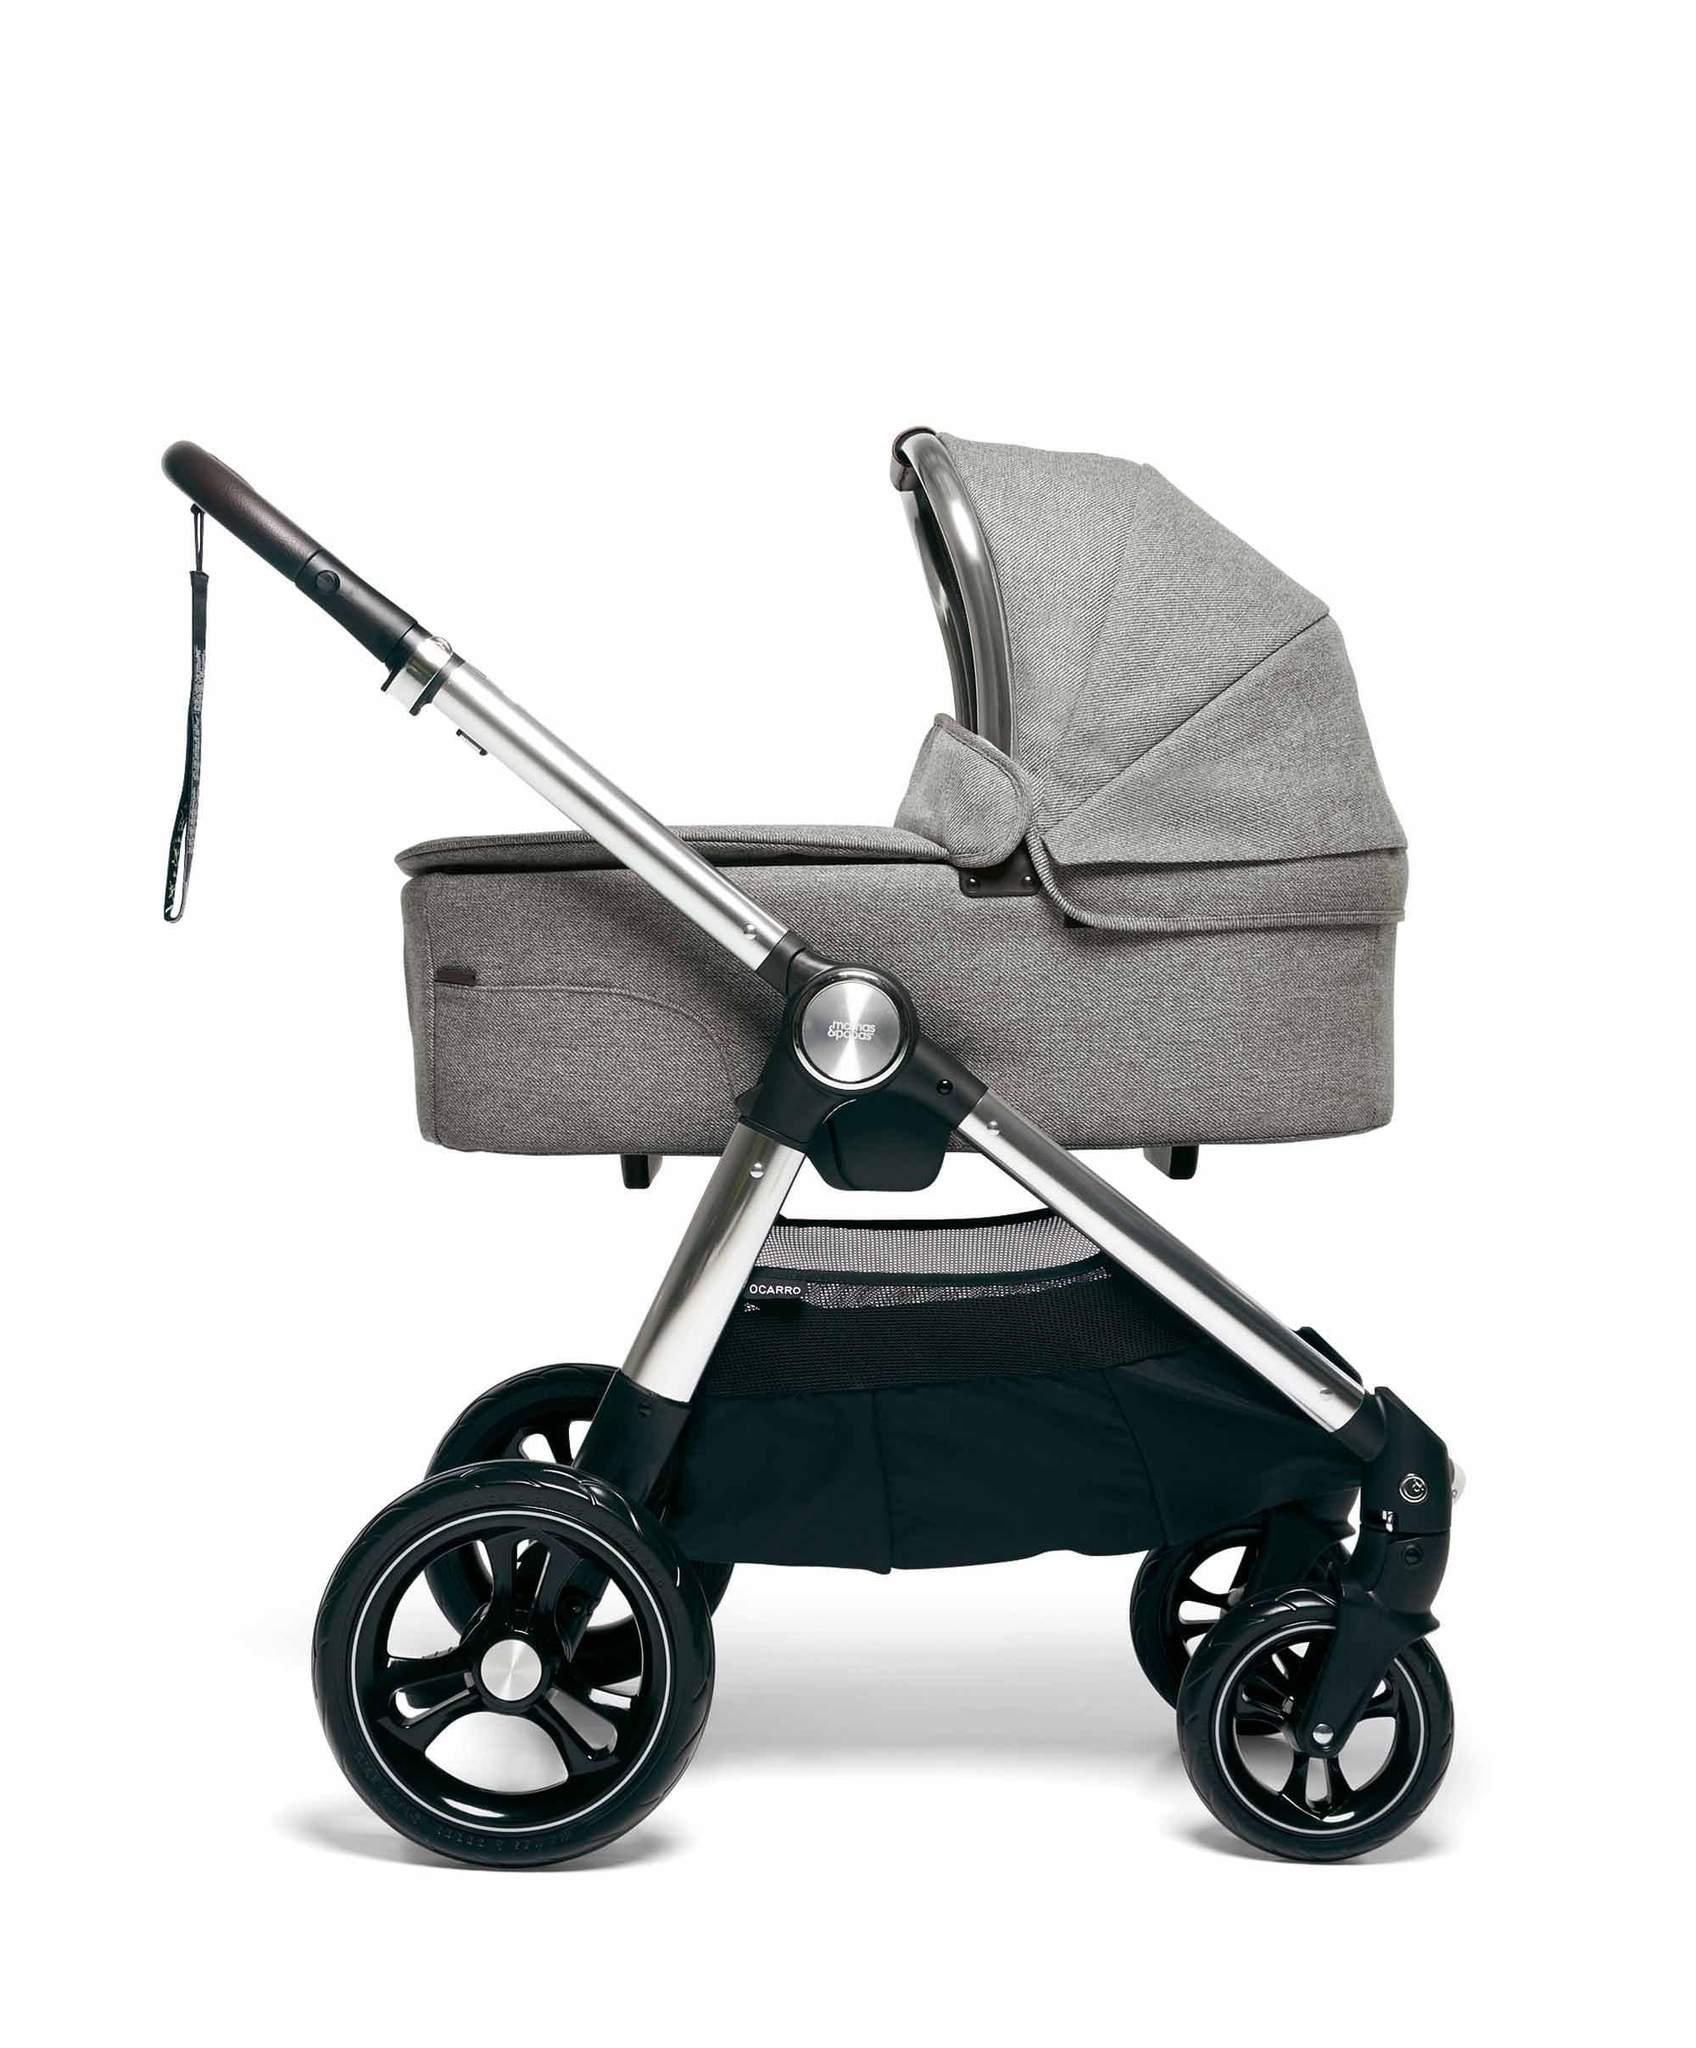 mamas-papas-pushchairs-ocarro-4-piece-starter-bundle-woven-grey-24090832535717_1024x1024@2x